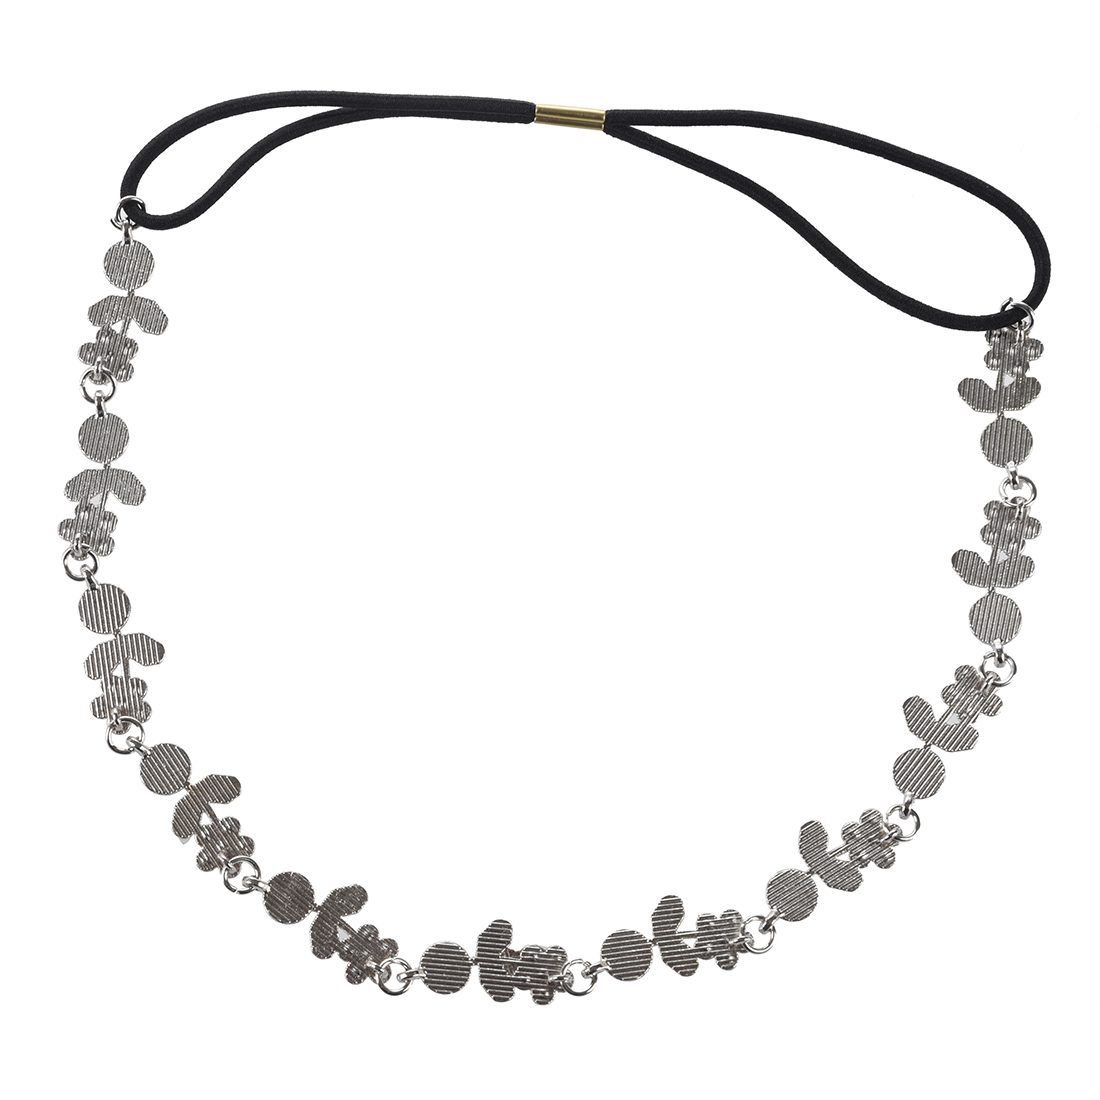 Xiao Yu's Store TFGS-Hair Headband Elegant Elastic Headband with Rhinestones Flowers for Women - Silver